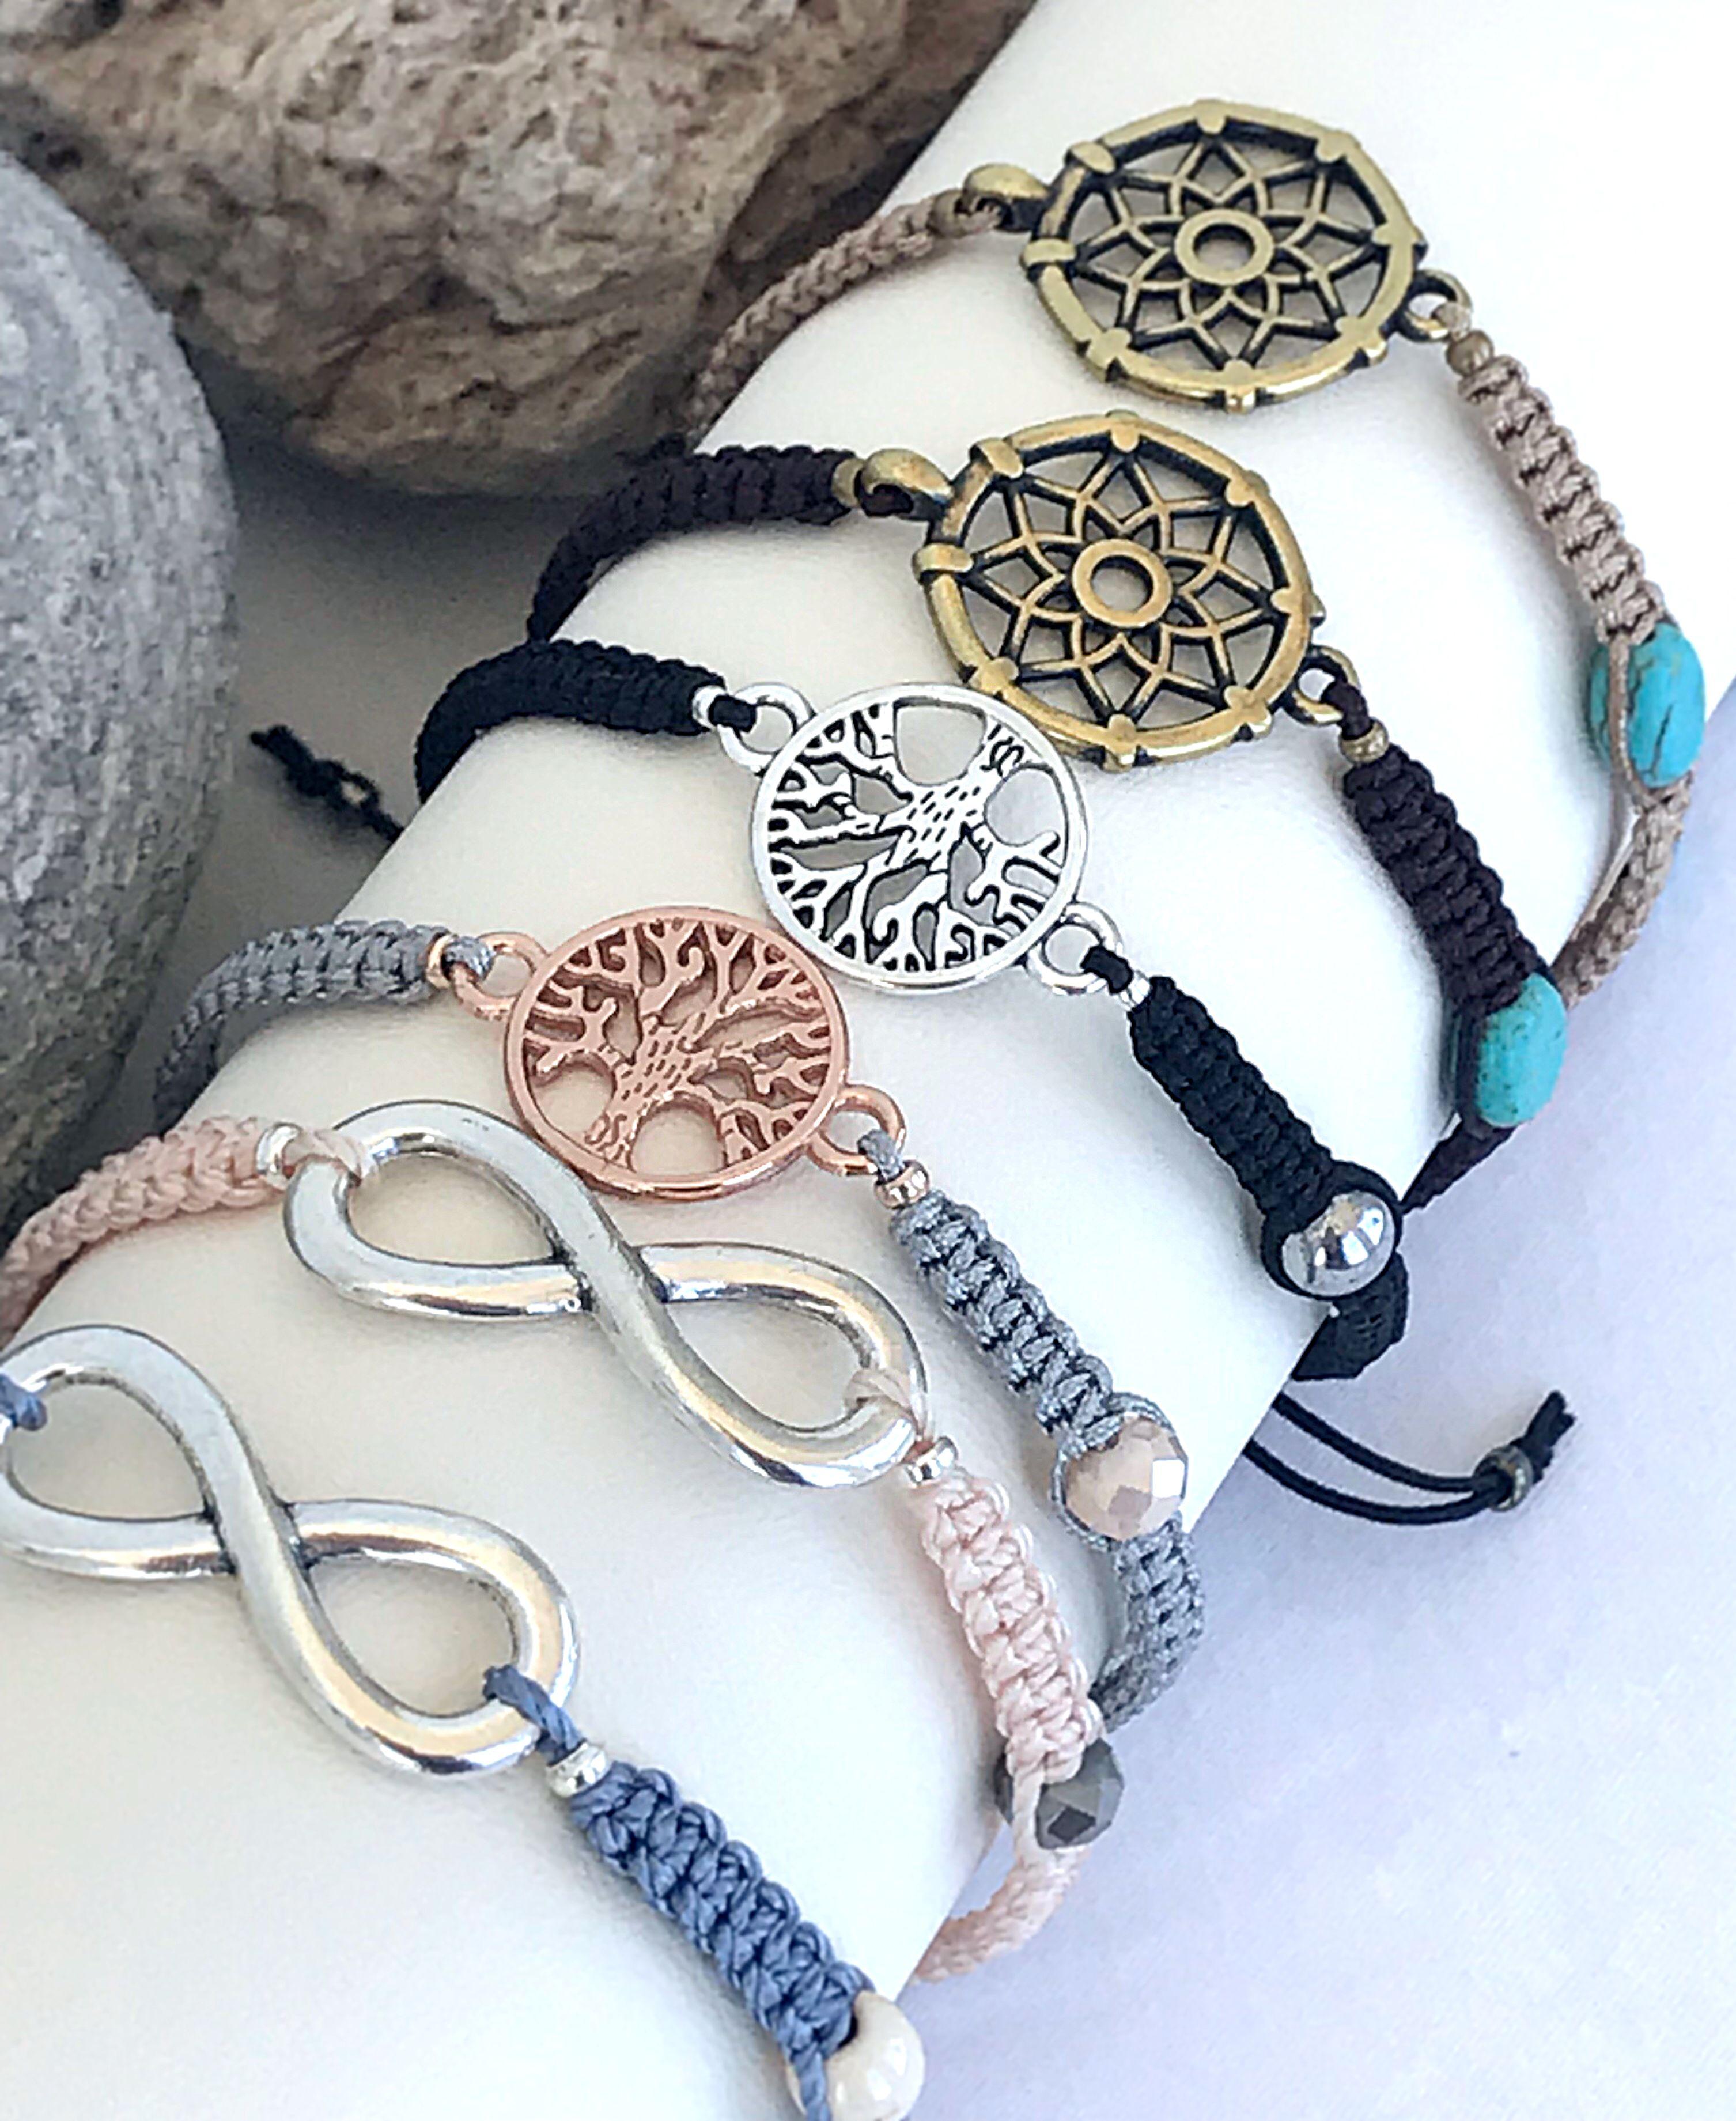 Handmade Gemstones Mala And Spiritual Jewelry By Katiaicrafts Bracelets Friends Soulmate